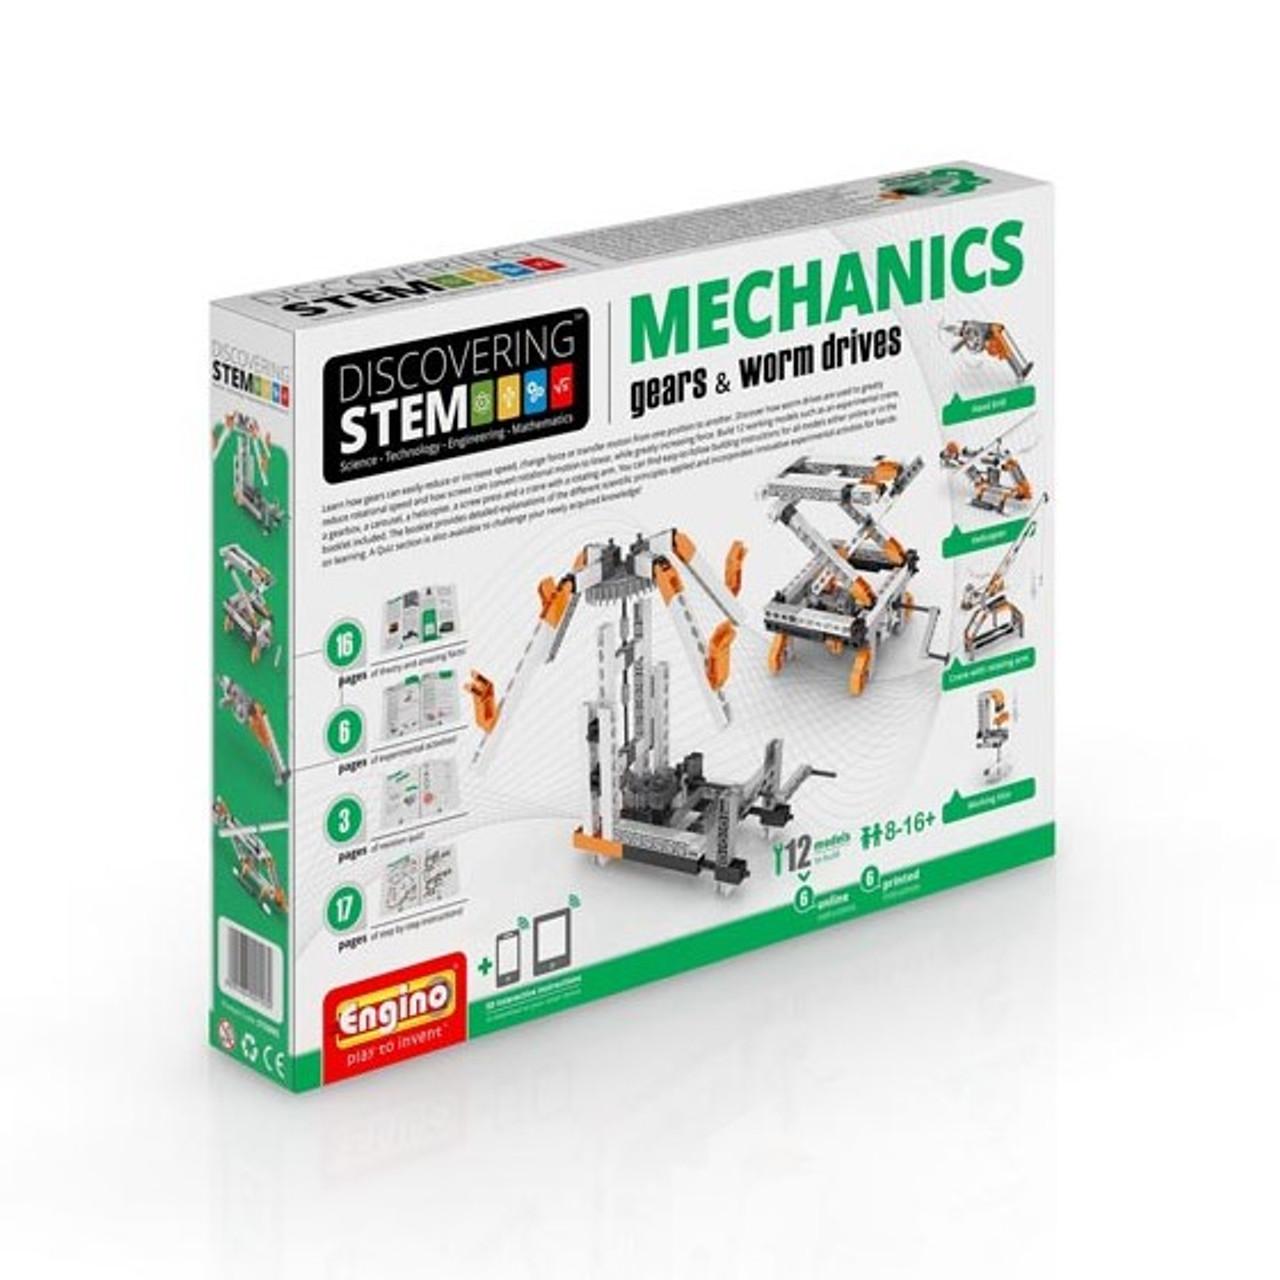 STEM Mechanics: Gears & Worm Drives